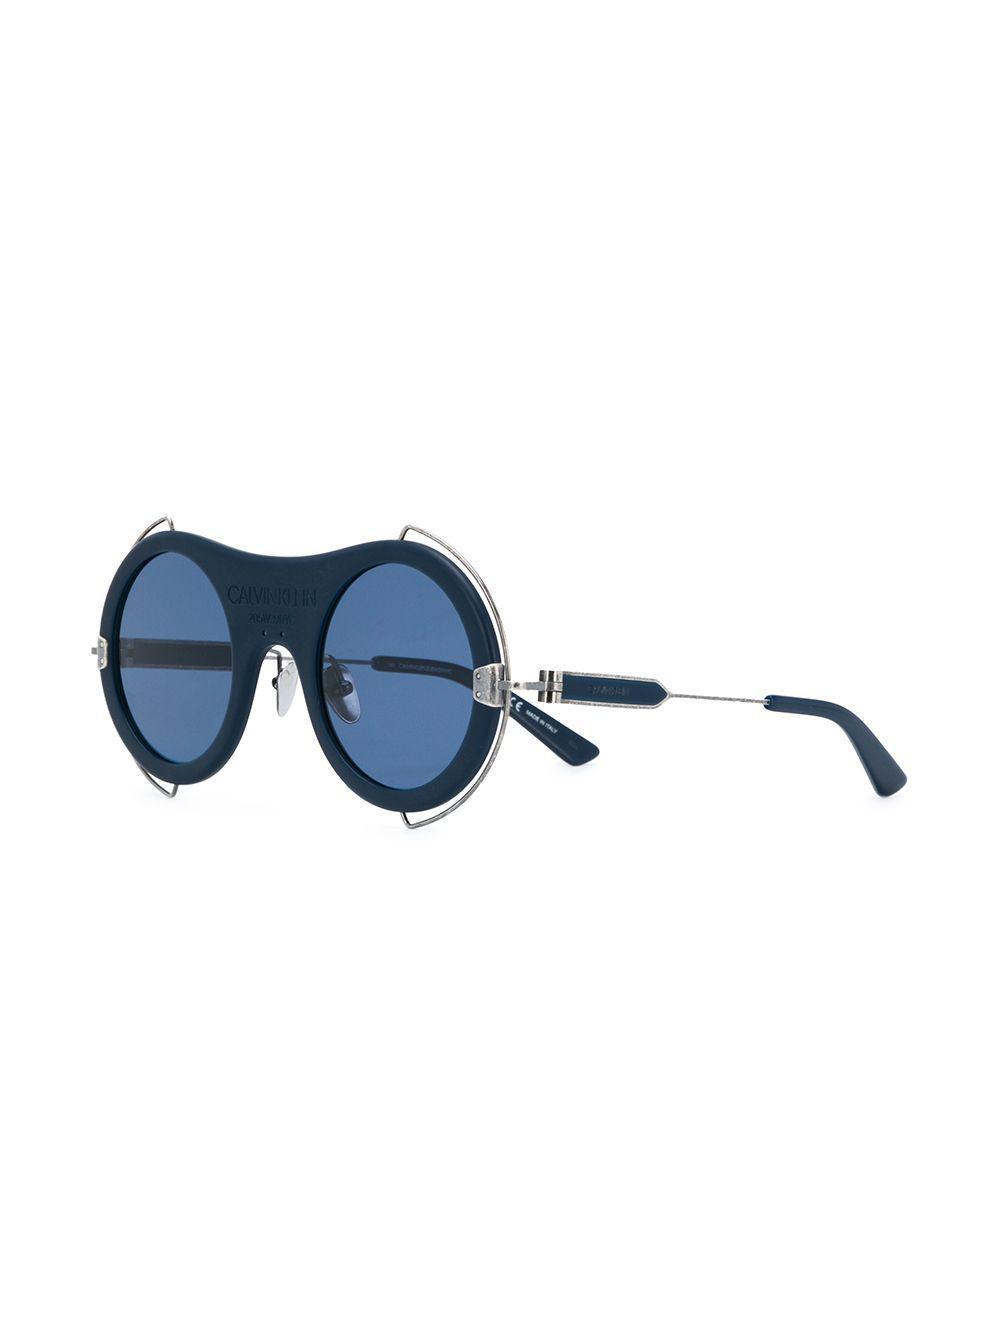 7b76d34d9 CALVIN KLEIN 205W39NYC Round Frame Sunglasses in Blue - Lyst